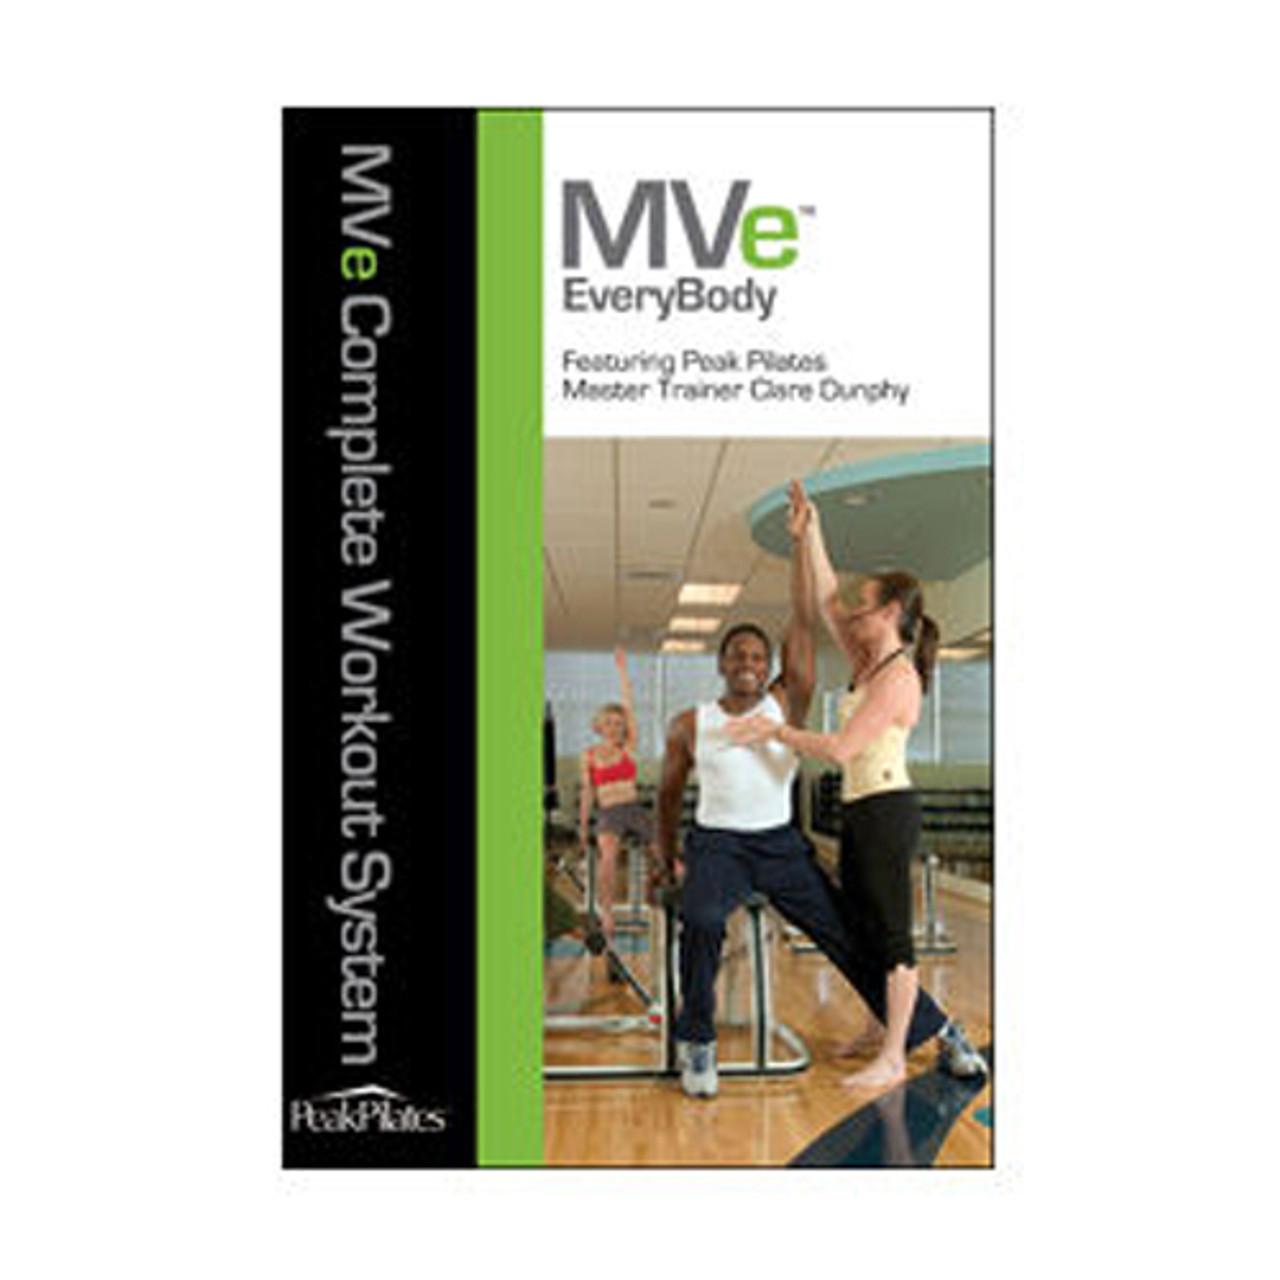 Pilates Chair Dvds Lifes Beach: Test Title